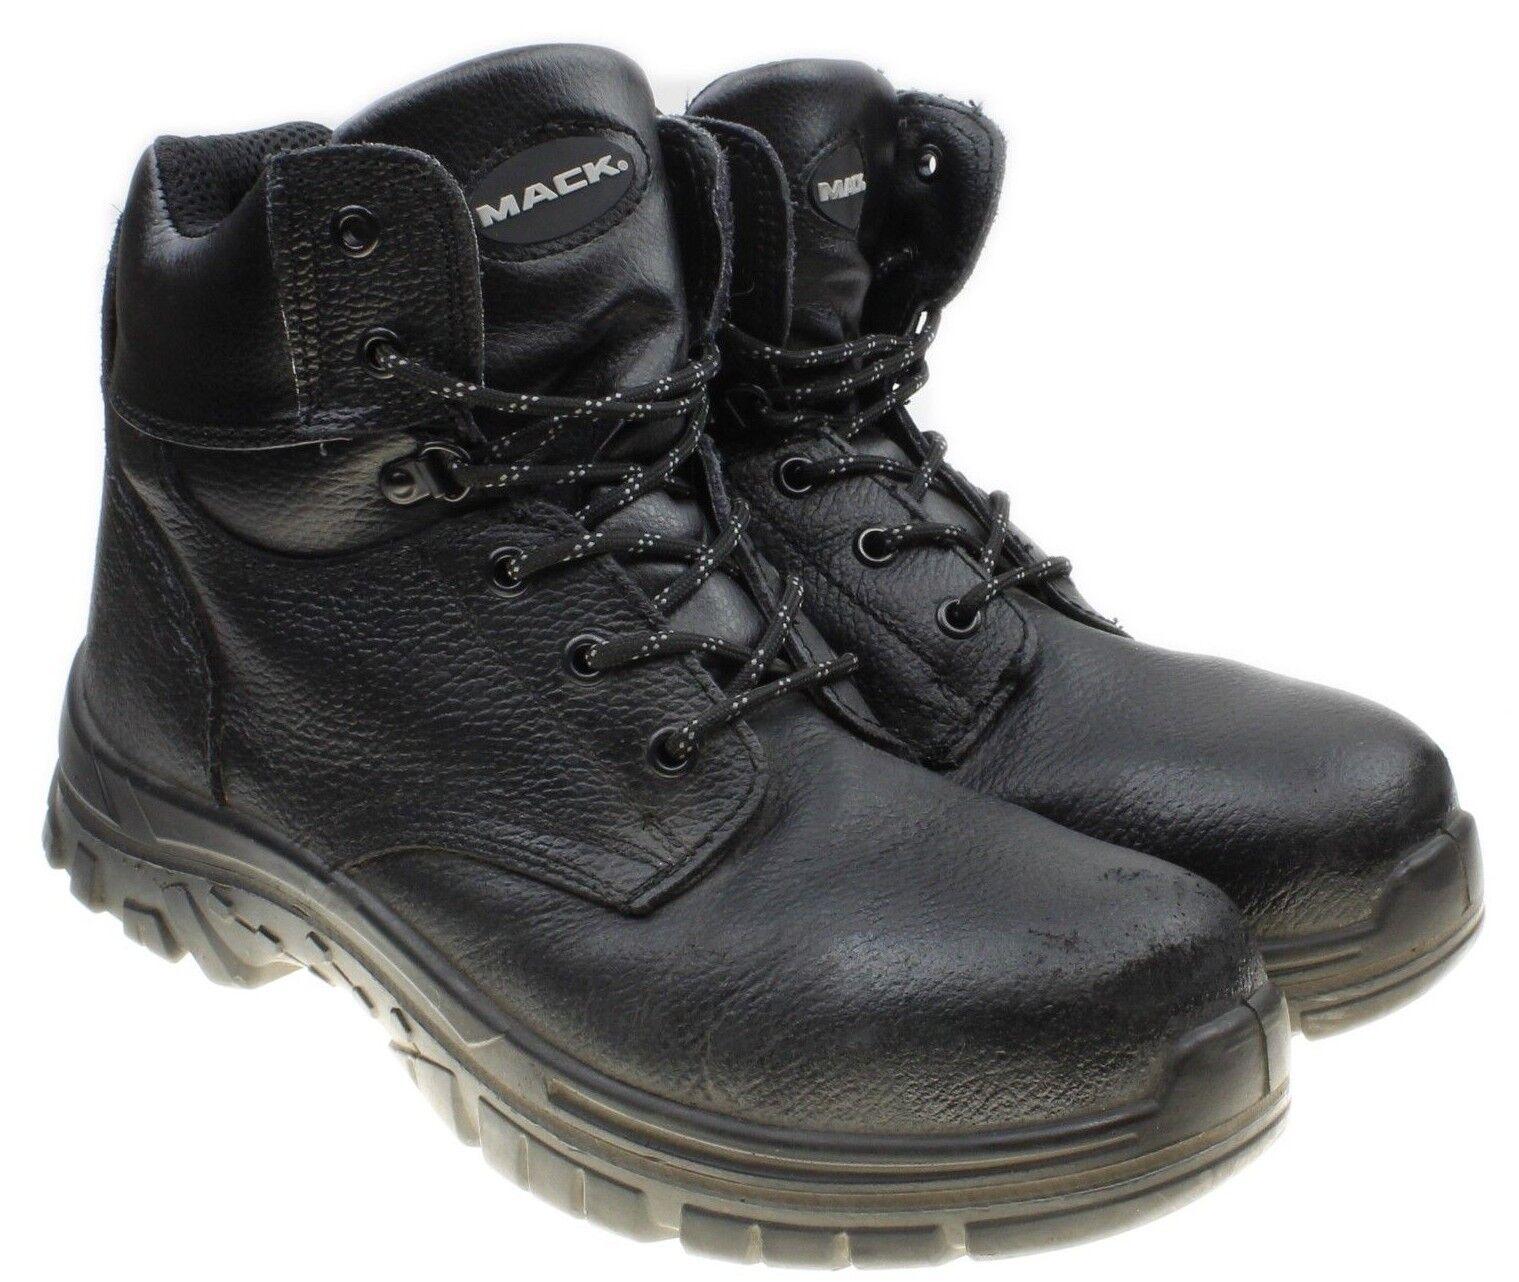 Mack Tradesman Steel Toe Black Leather Boots Slip Resistant Men's Sz 11.5